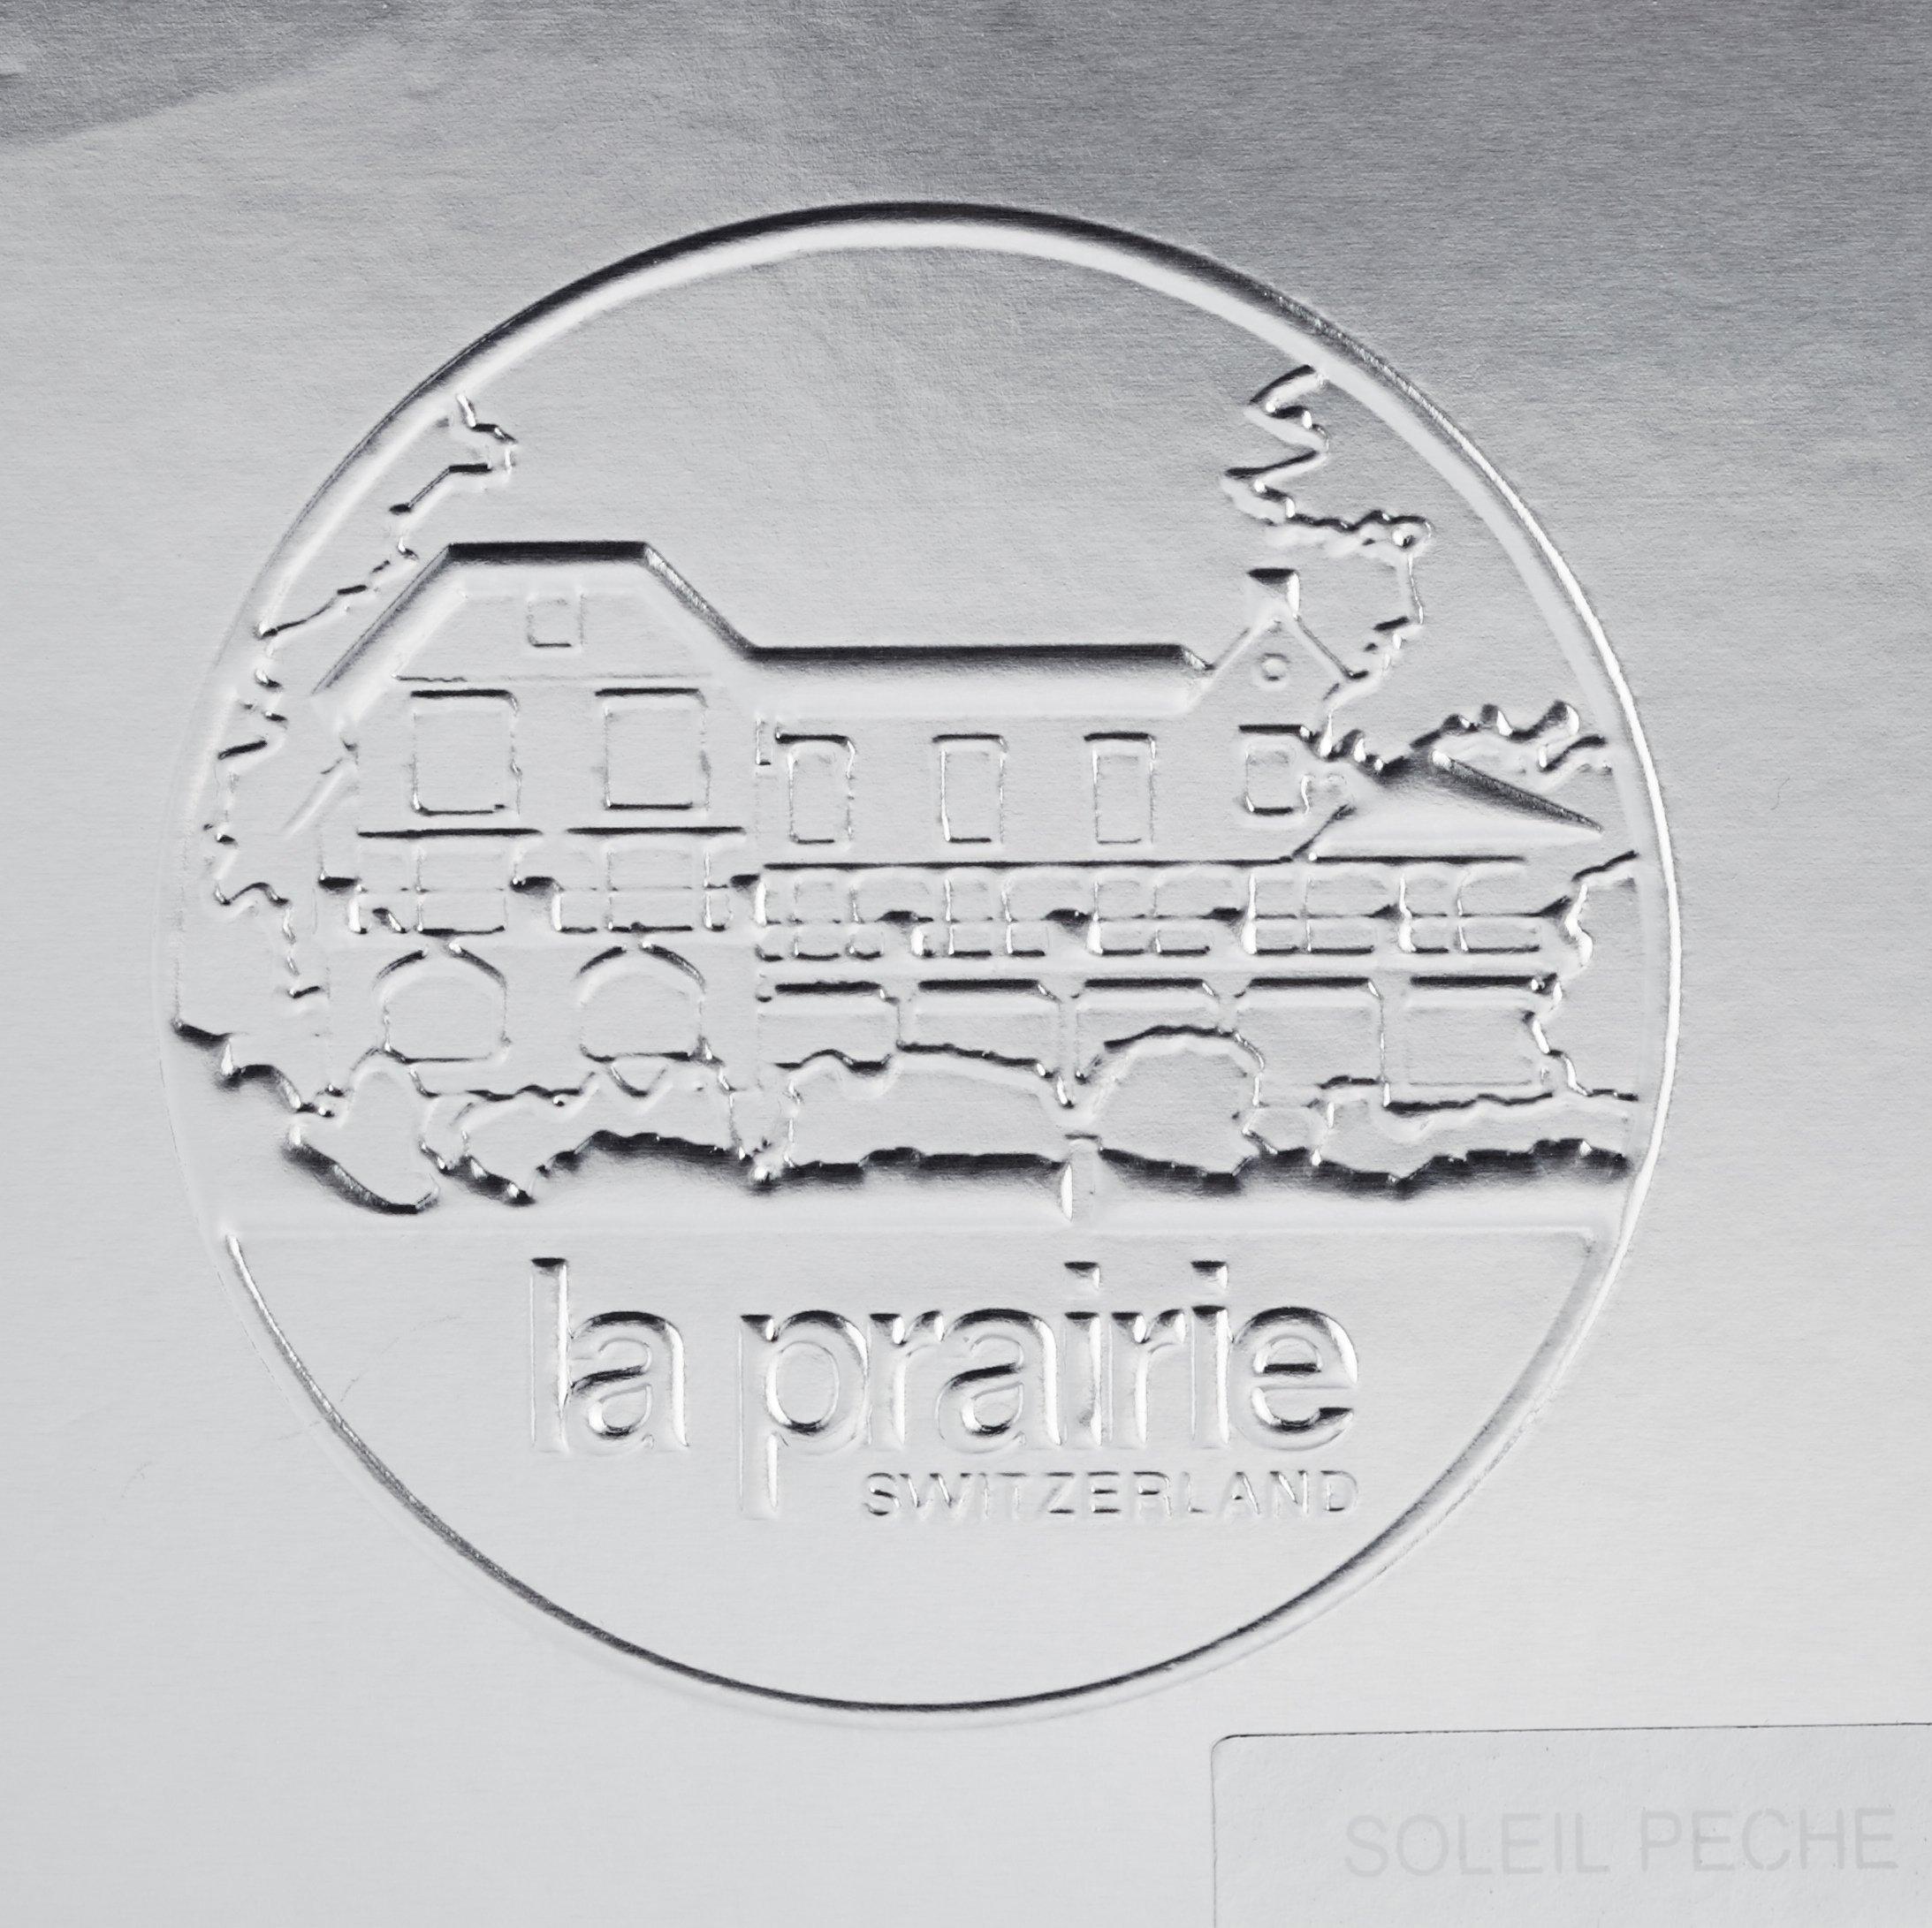 La Prairie Skin Caviar Concealer Foundation SPF 15, Soleil Peche, 1 Ounce